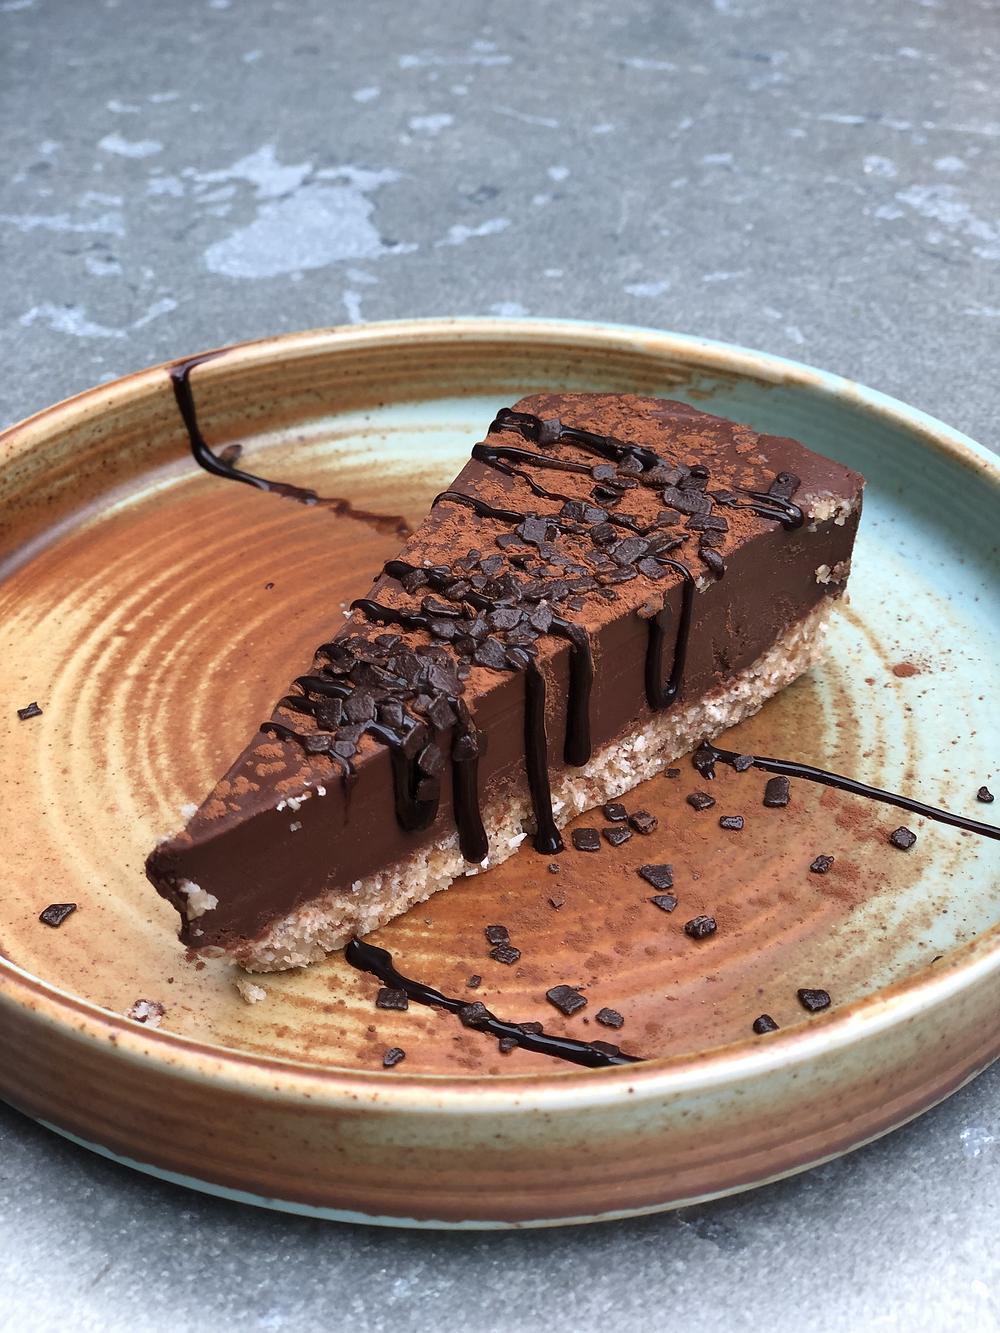 Chocolate cake at 'Pura Vida Foodbar' Midsland Terschelling